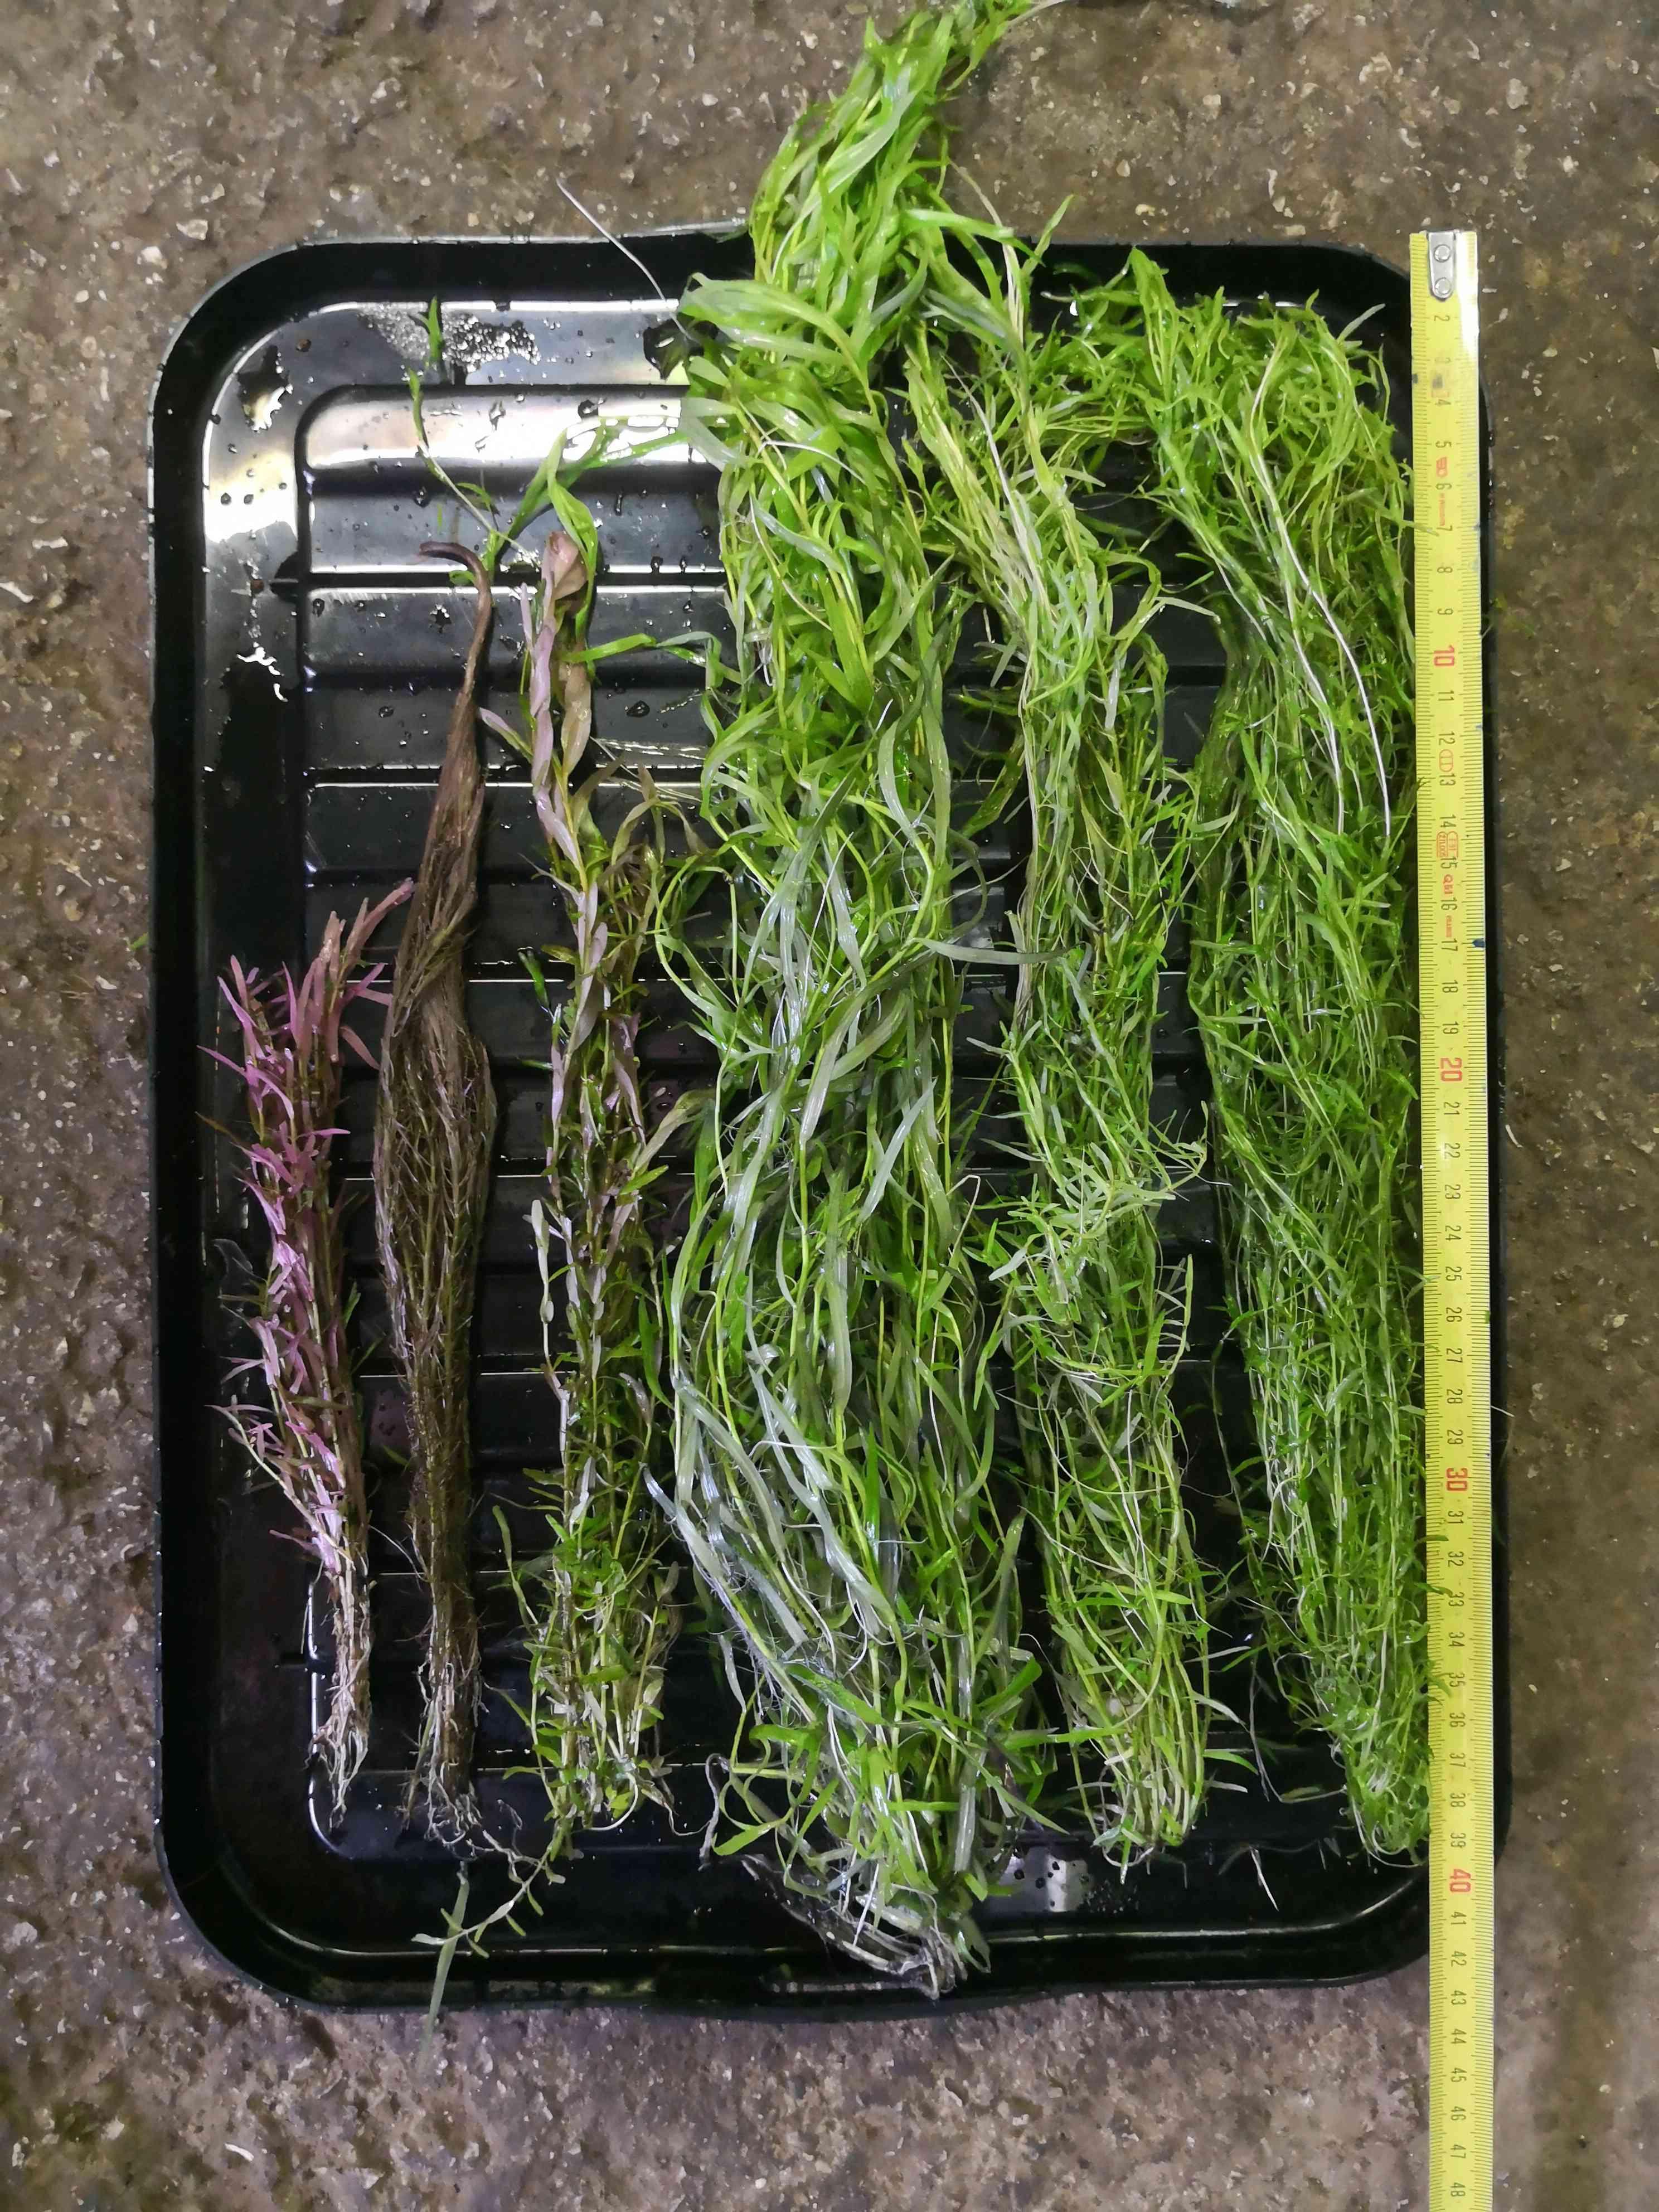 [Vends] Vente flash Plantes [73 + Envoi] Img_2012